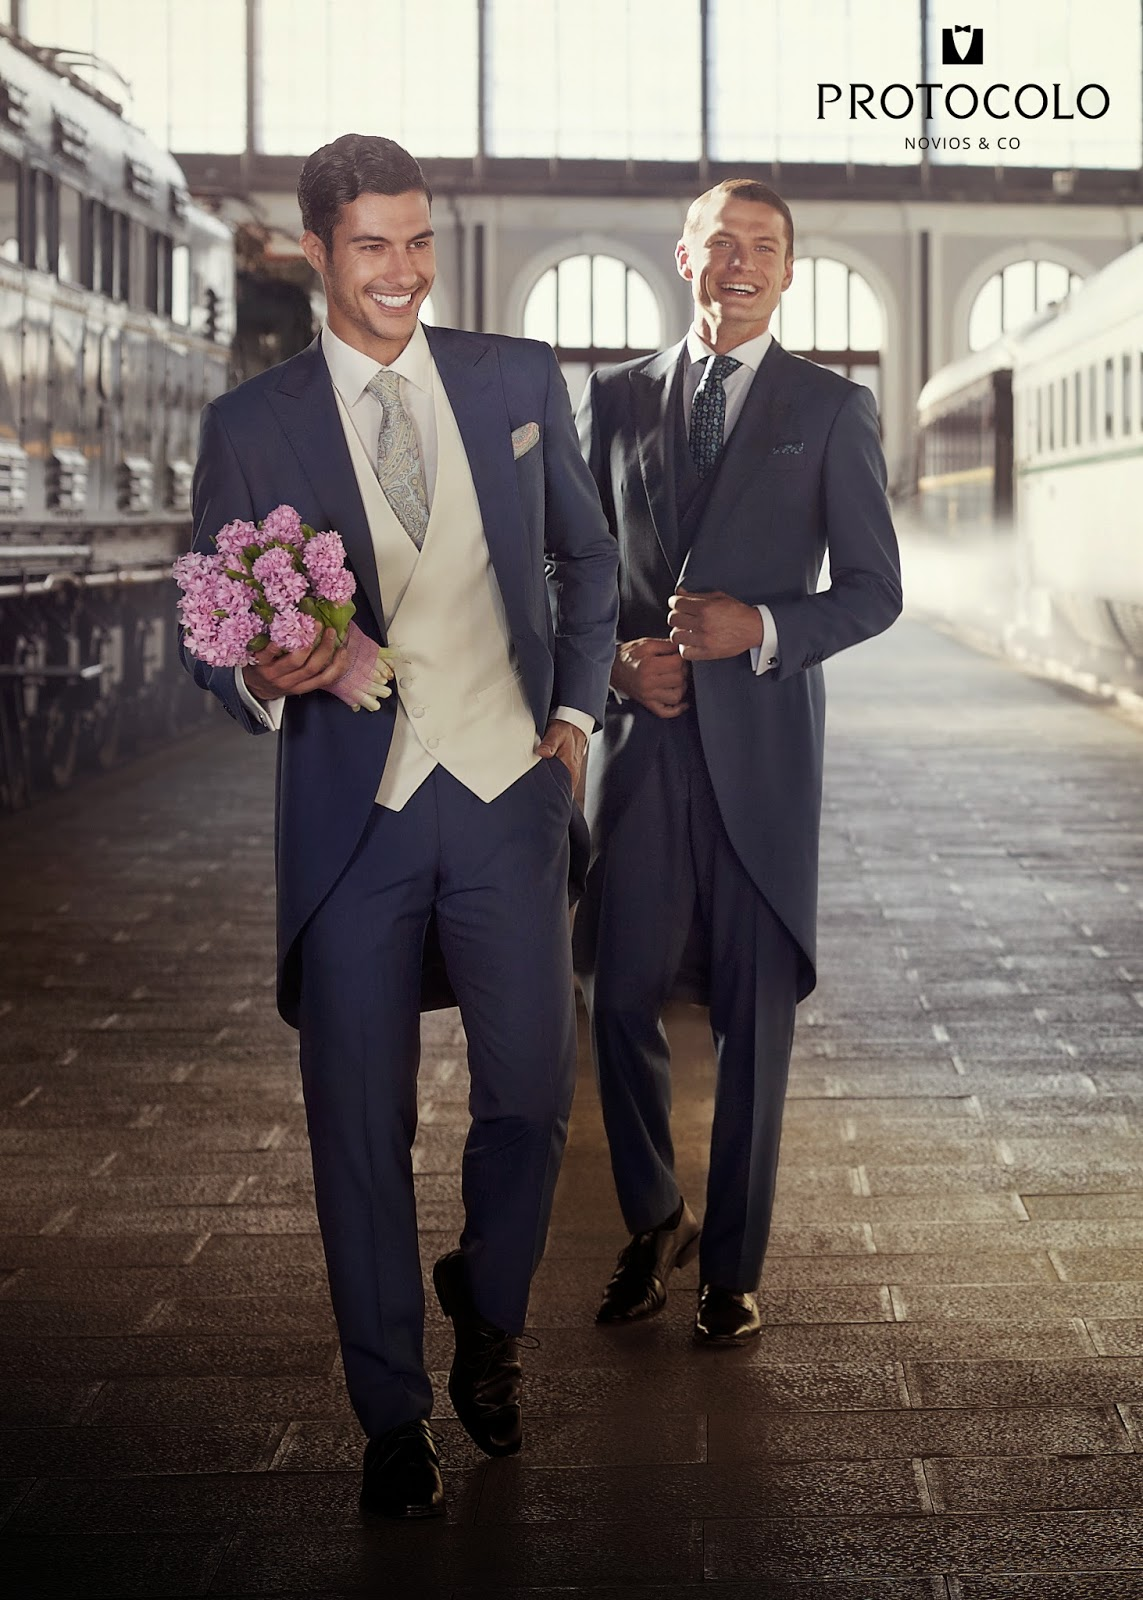 Protocolo novios guia tipos de traje de novio , chaqué blog bodas mi boda gratis